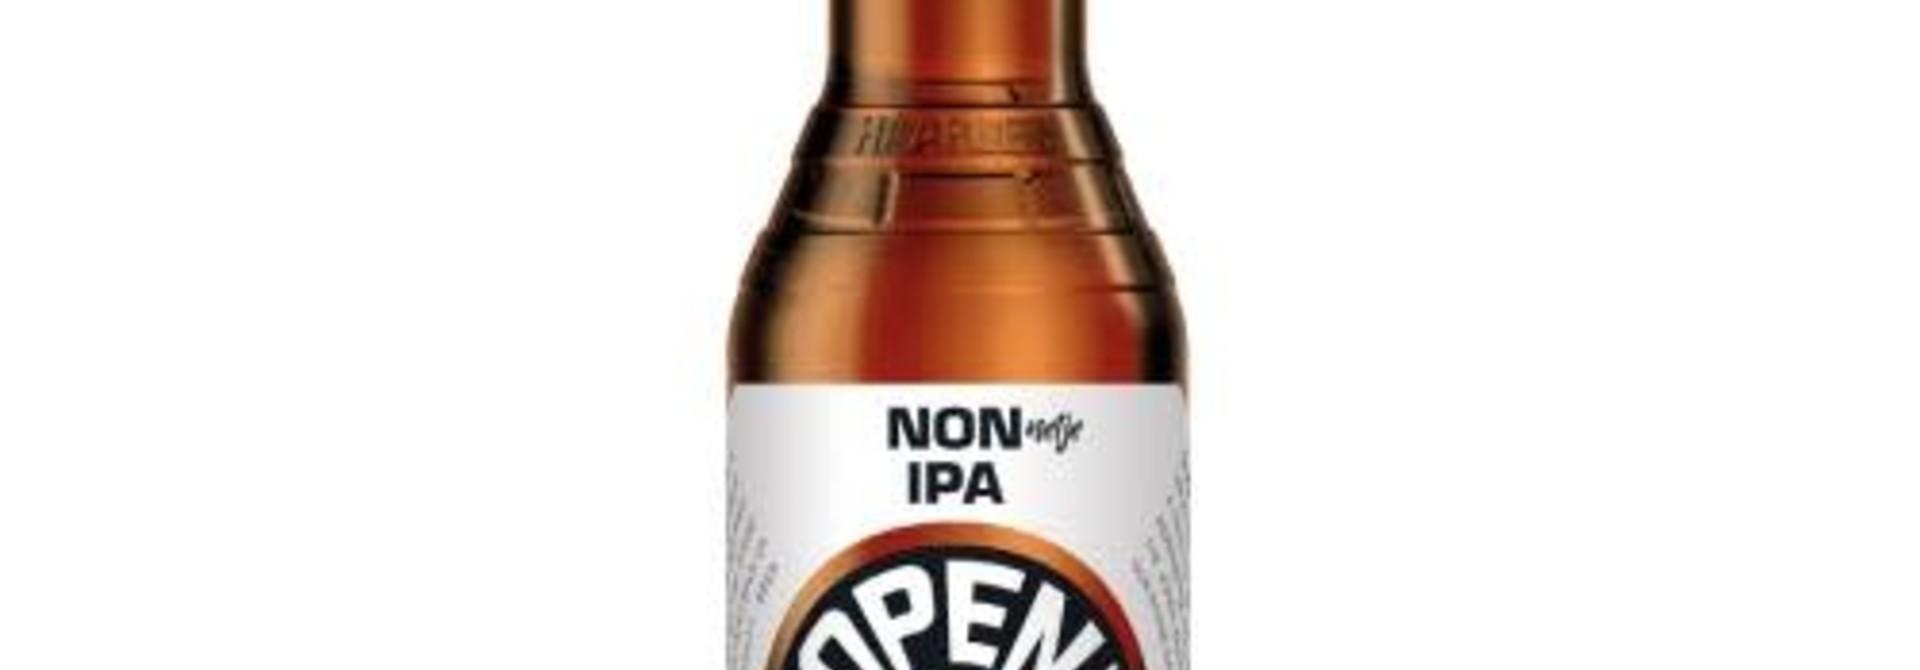 JOPEN - NON IPA 33CL